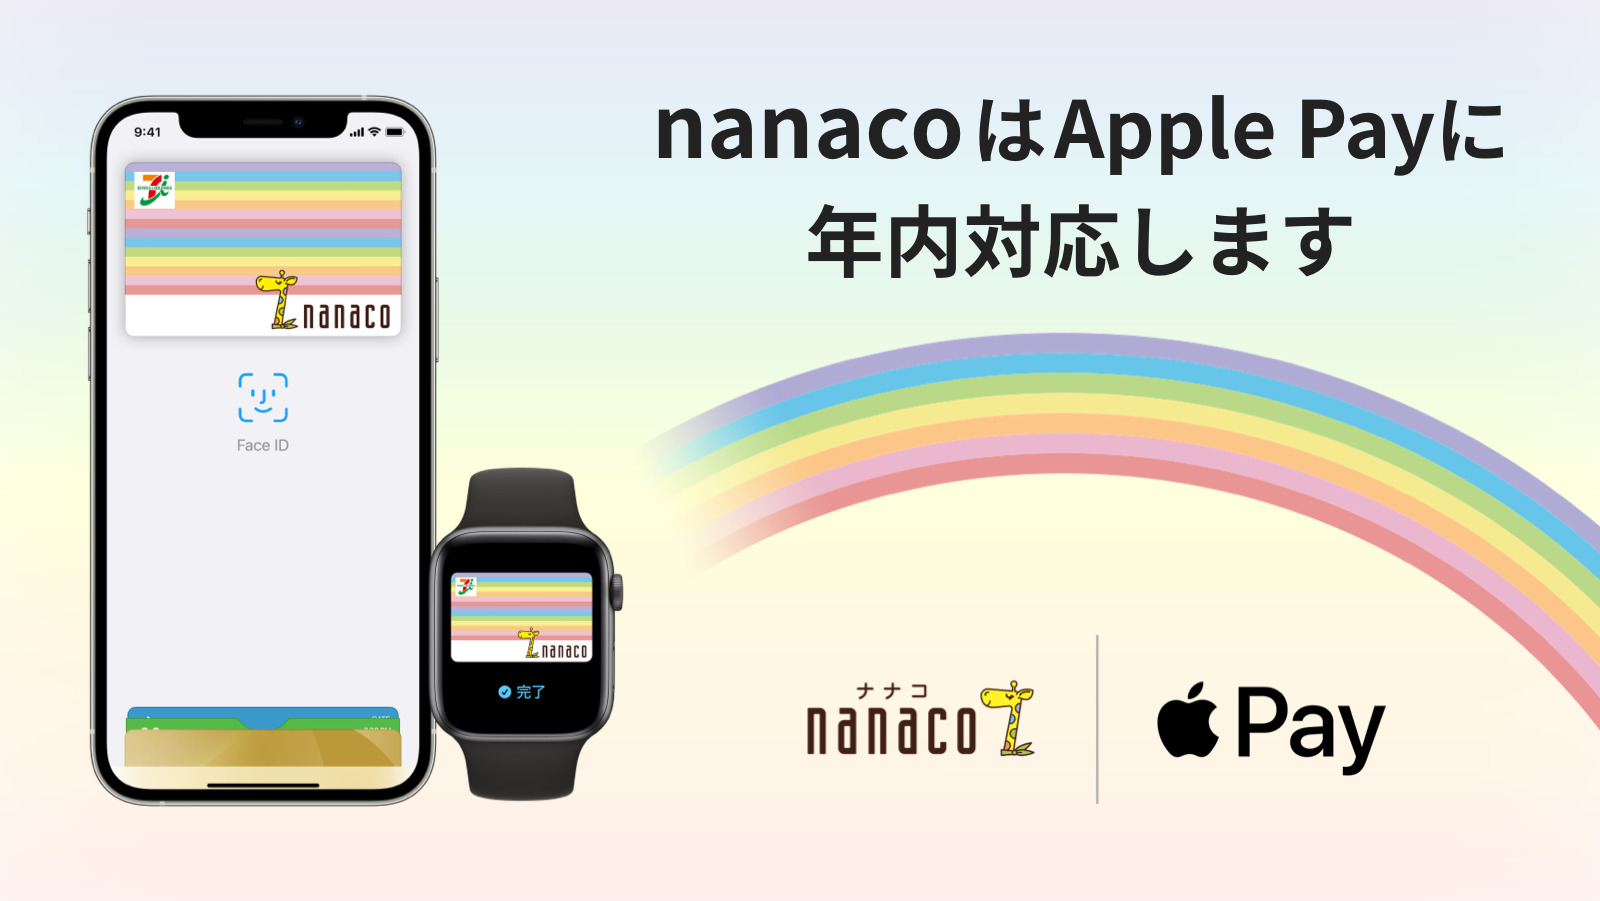 nanacoはApple Payに年内対応します